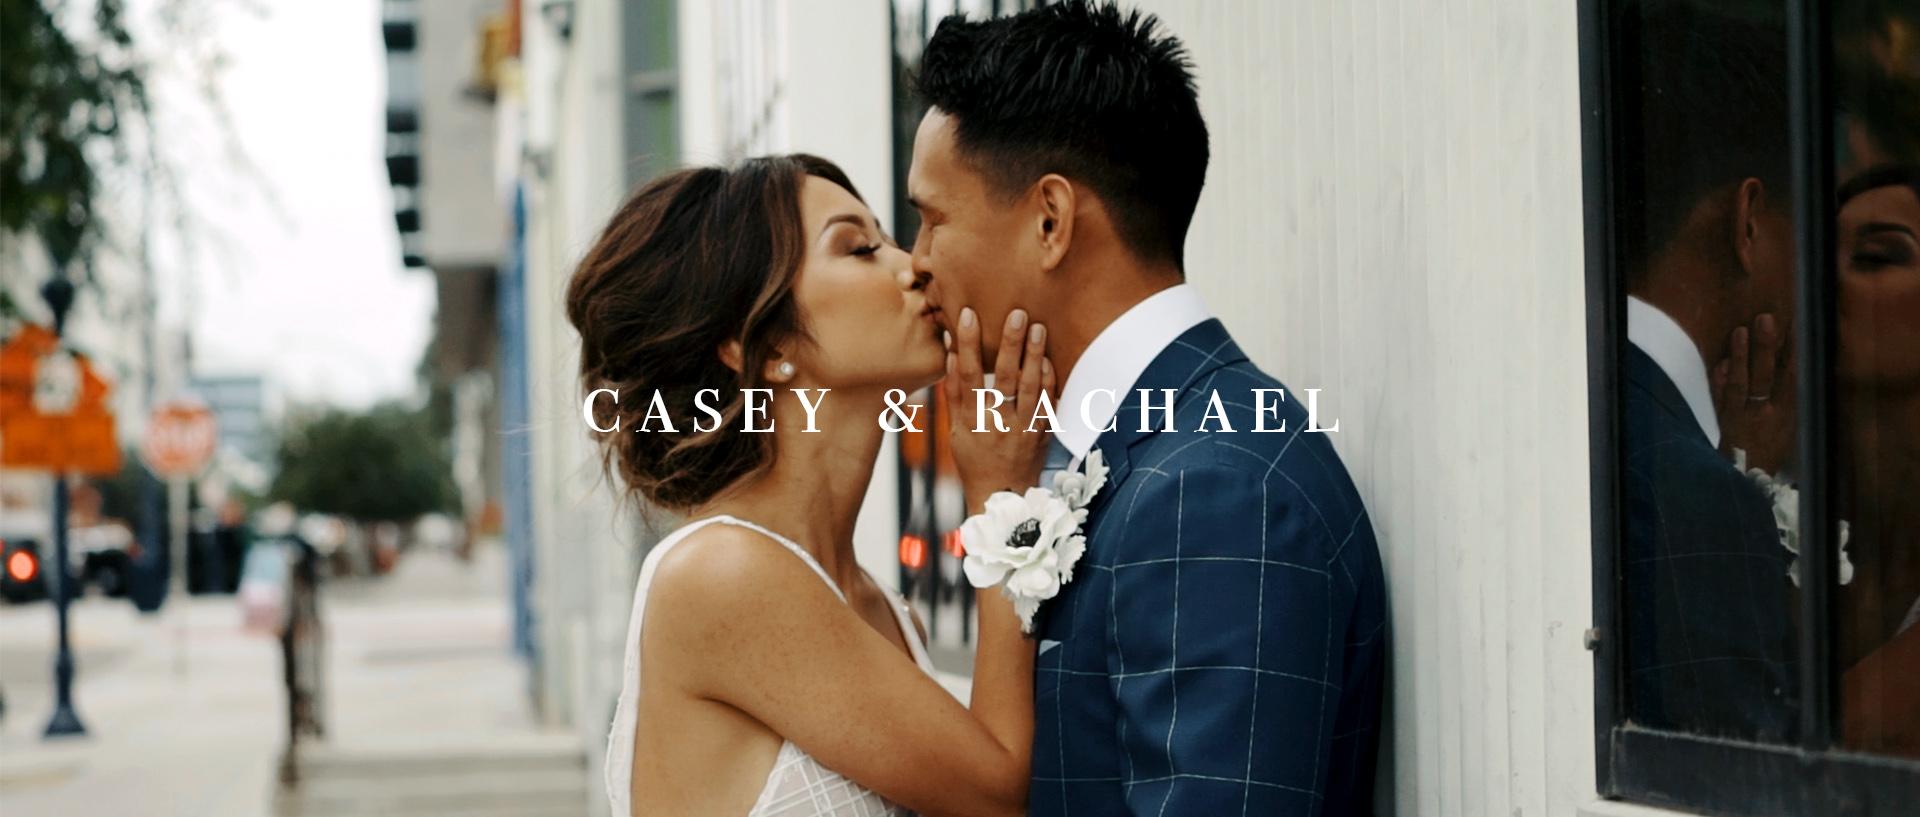 Casey + Rachael | San Diego, California | The Sandbox